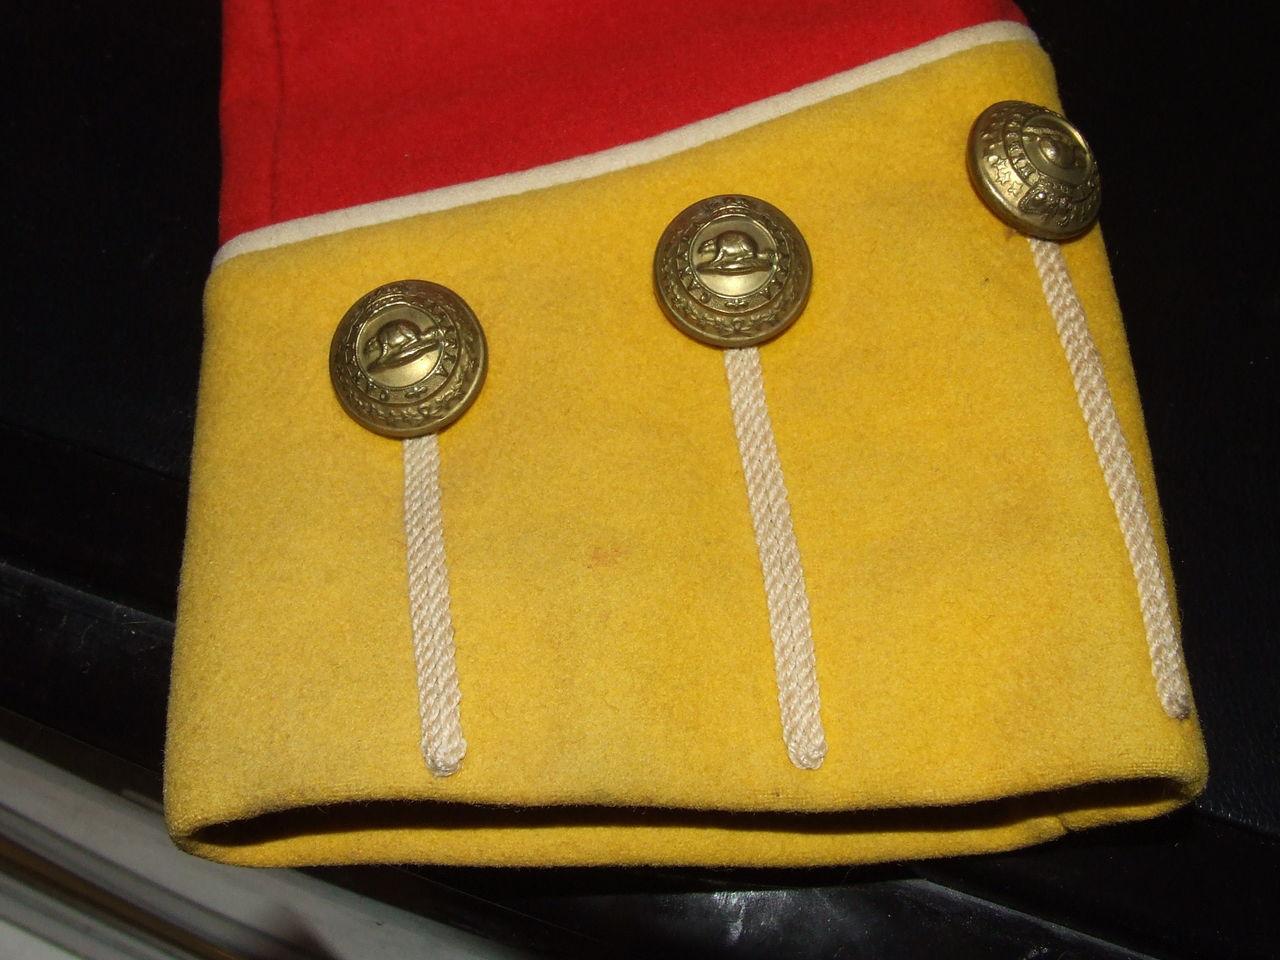 91st Canadian Highlanders Uniform 018